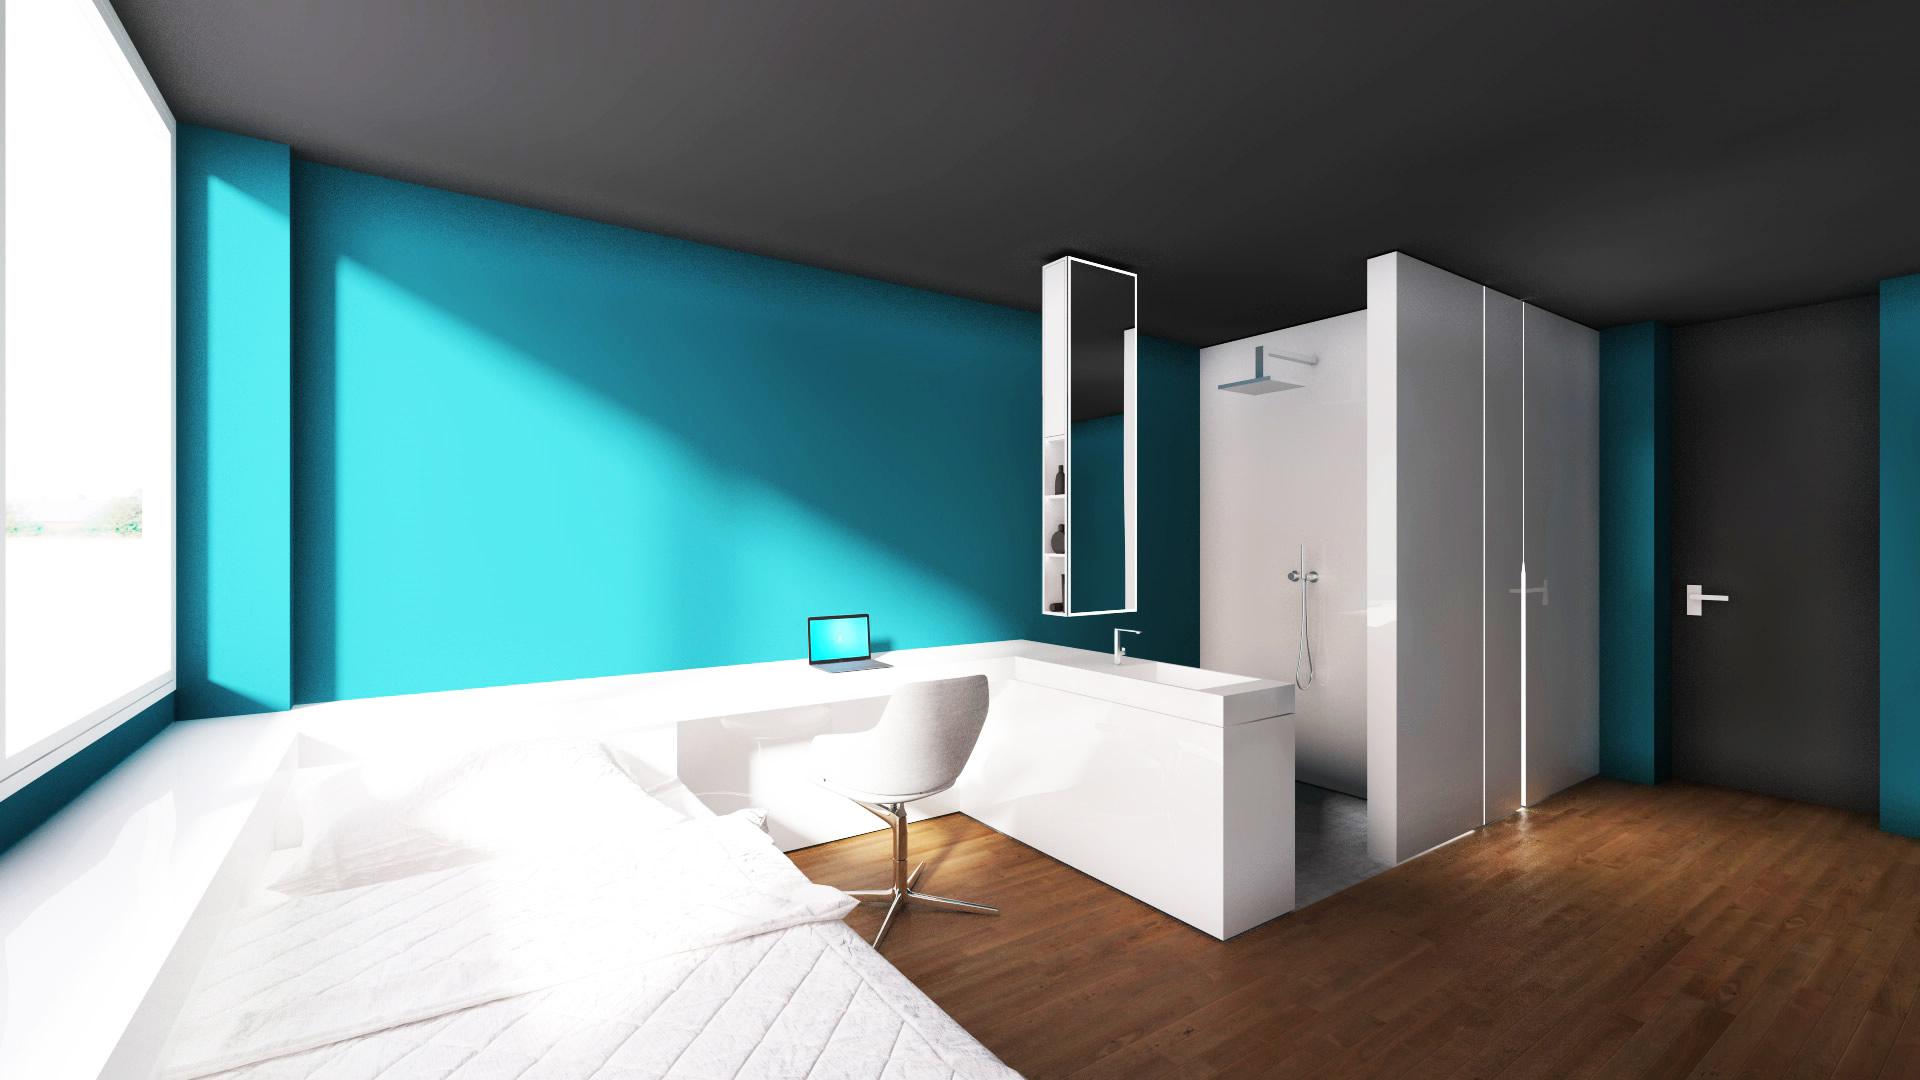 whocares_design_hotel_material-2